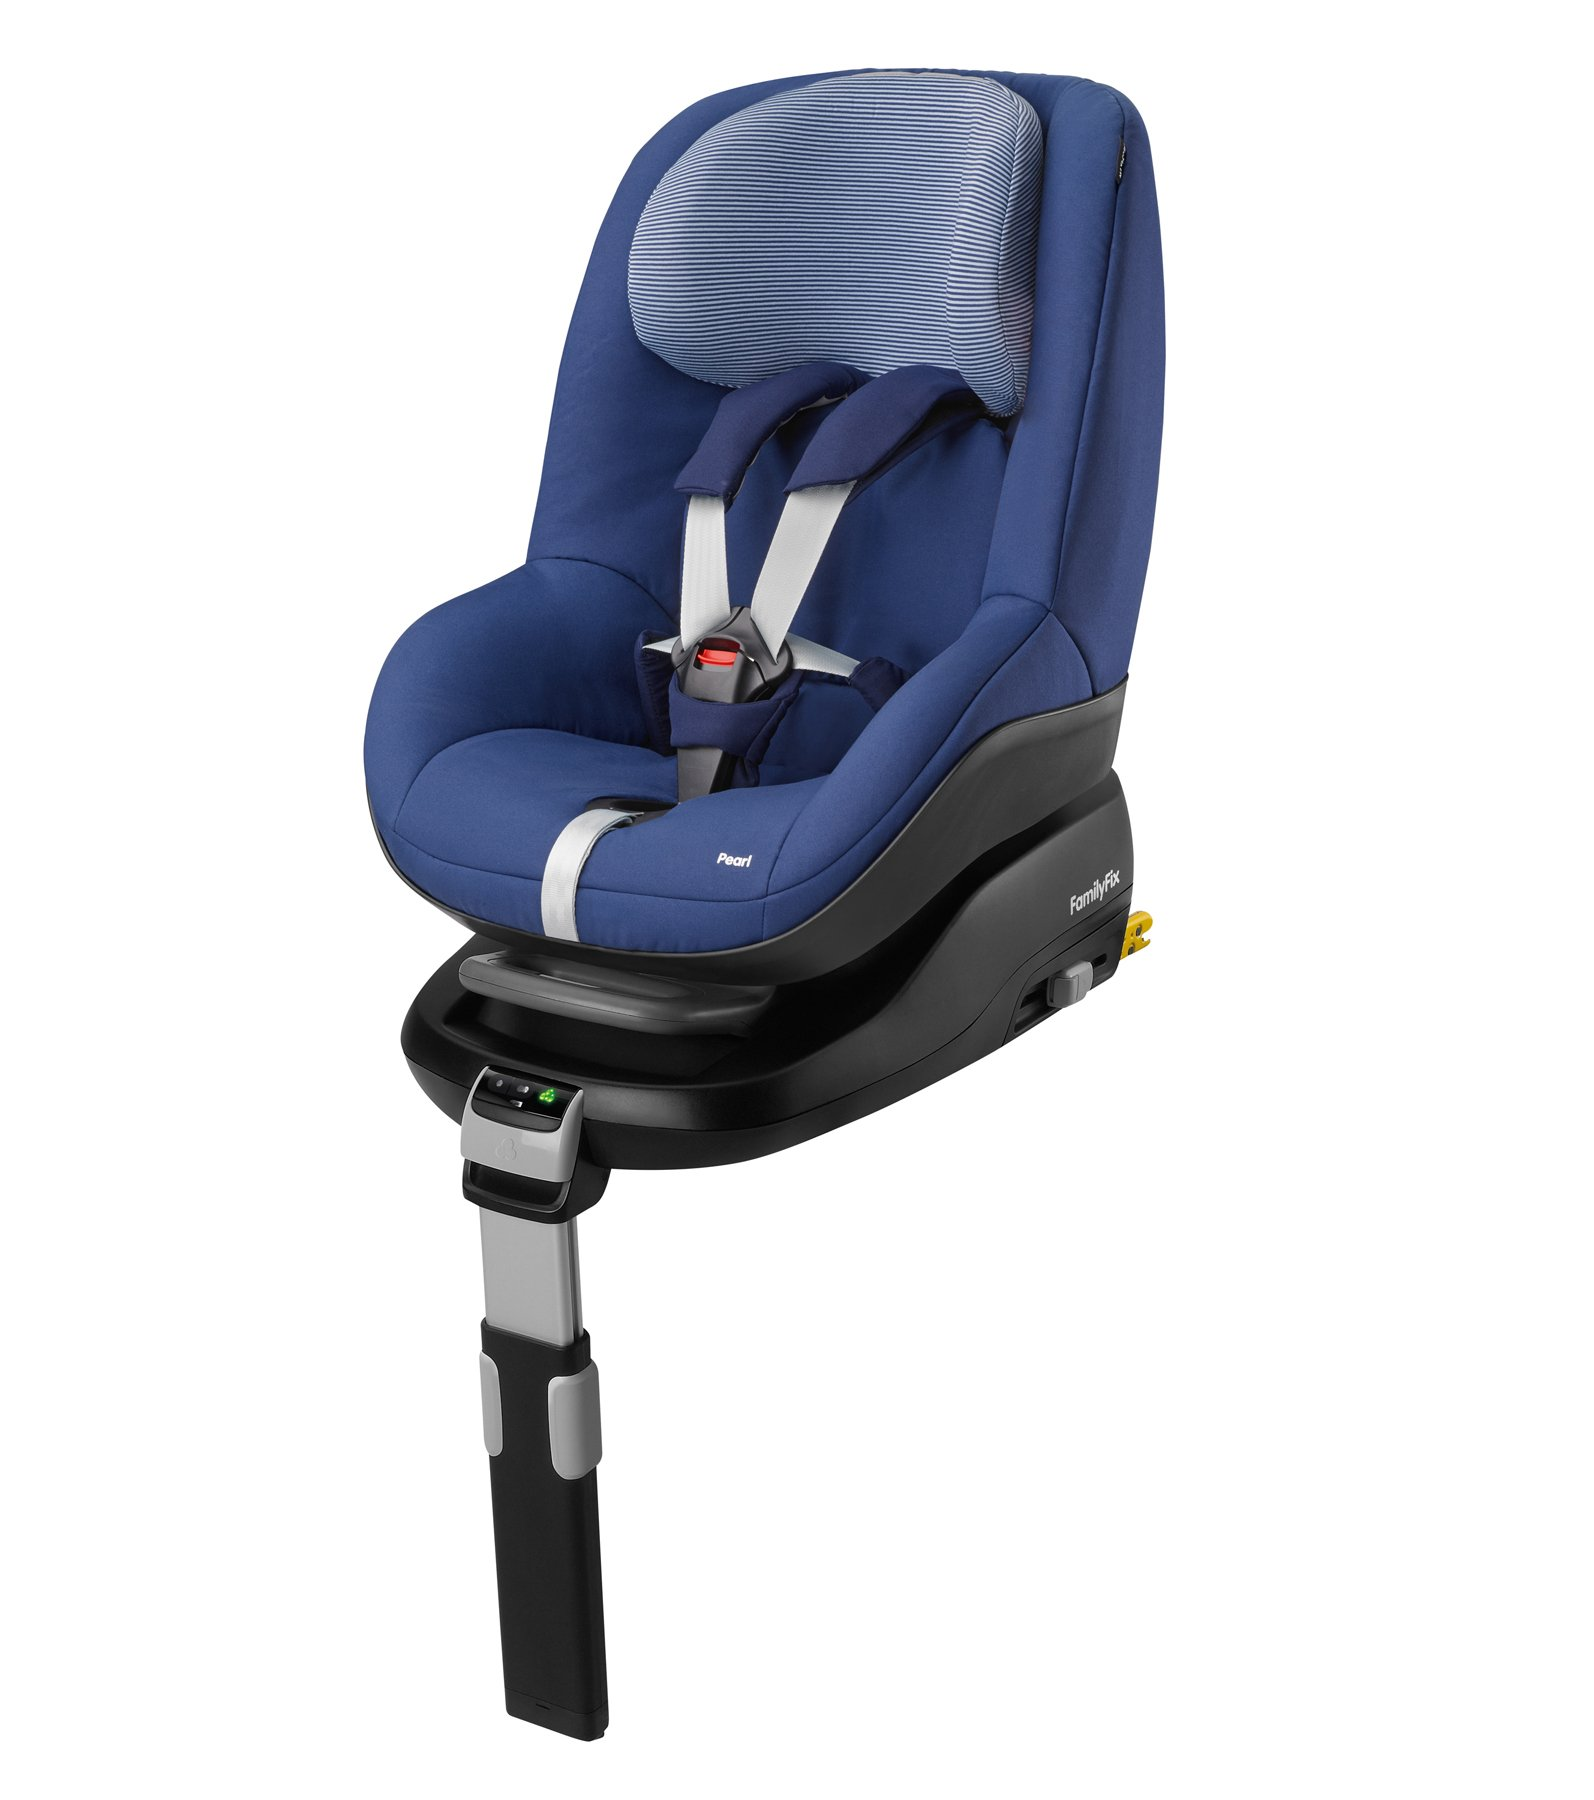 Maxi-Cosi 63409641Pearl Children's Seat, Group 1, 9-18kg Maxi-Cosi  13